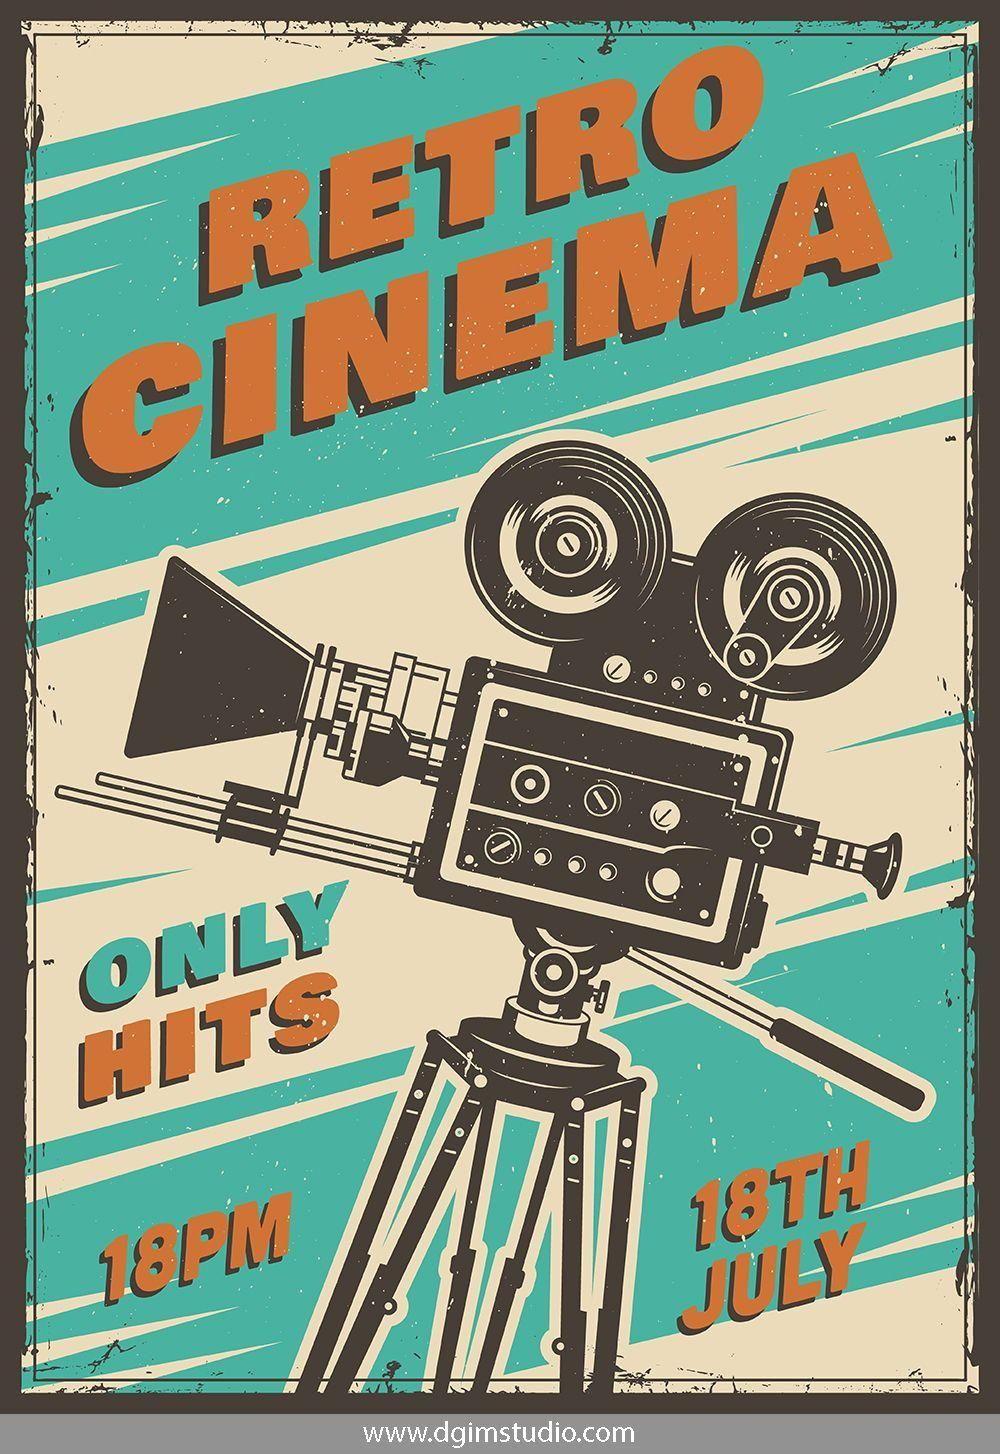 Vectorillustration Vector Illustration Design Dgimstudio Cinema Film Movie Camera Colorful C Di 2020 Sejarah Kuno Fotografi Tempo Dulu Kertas Dinding